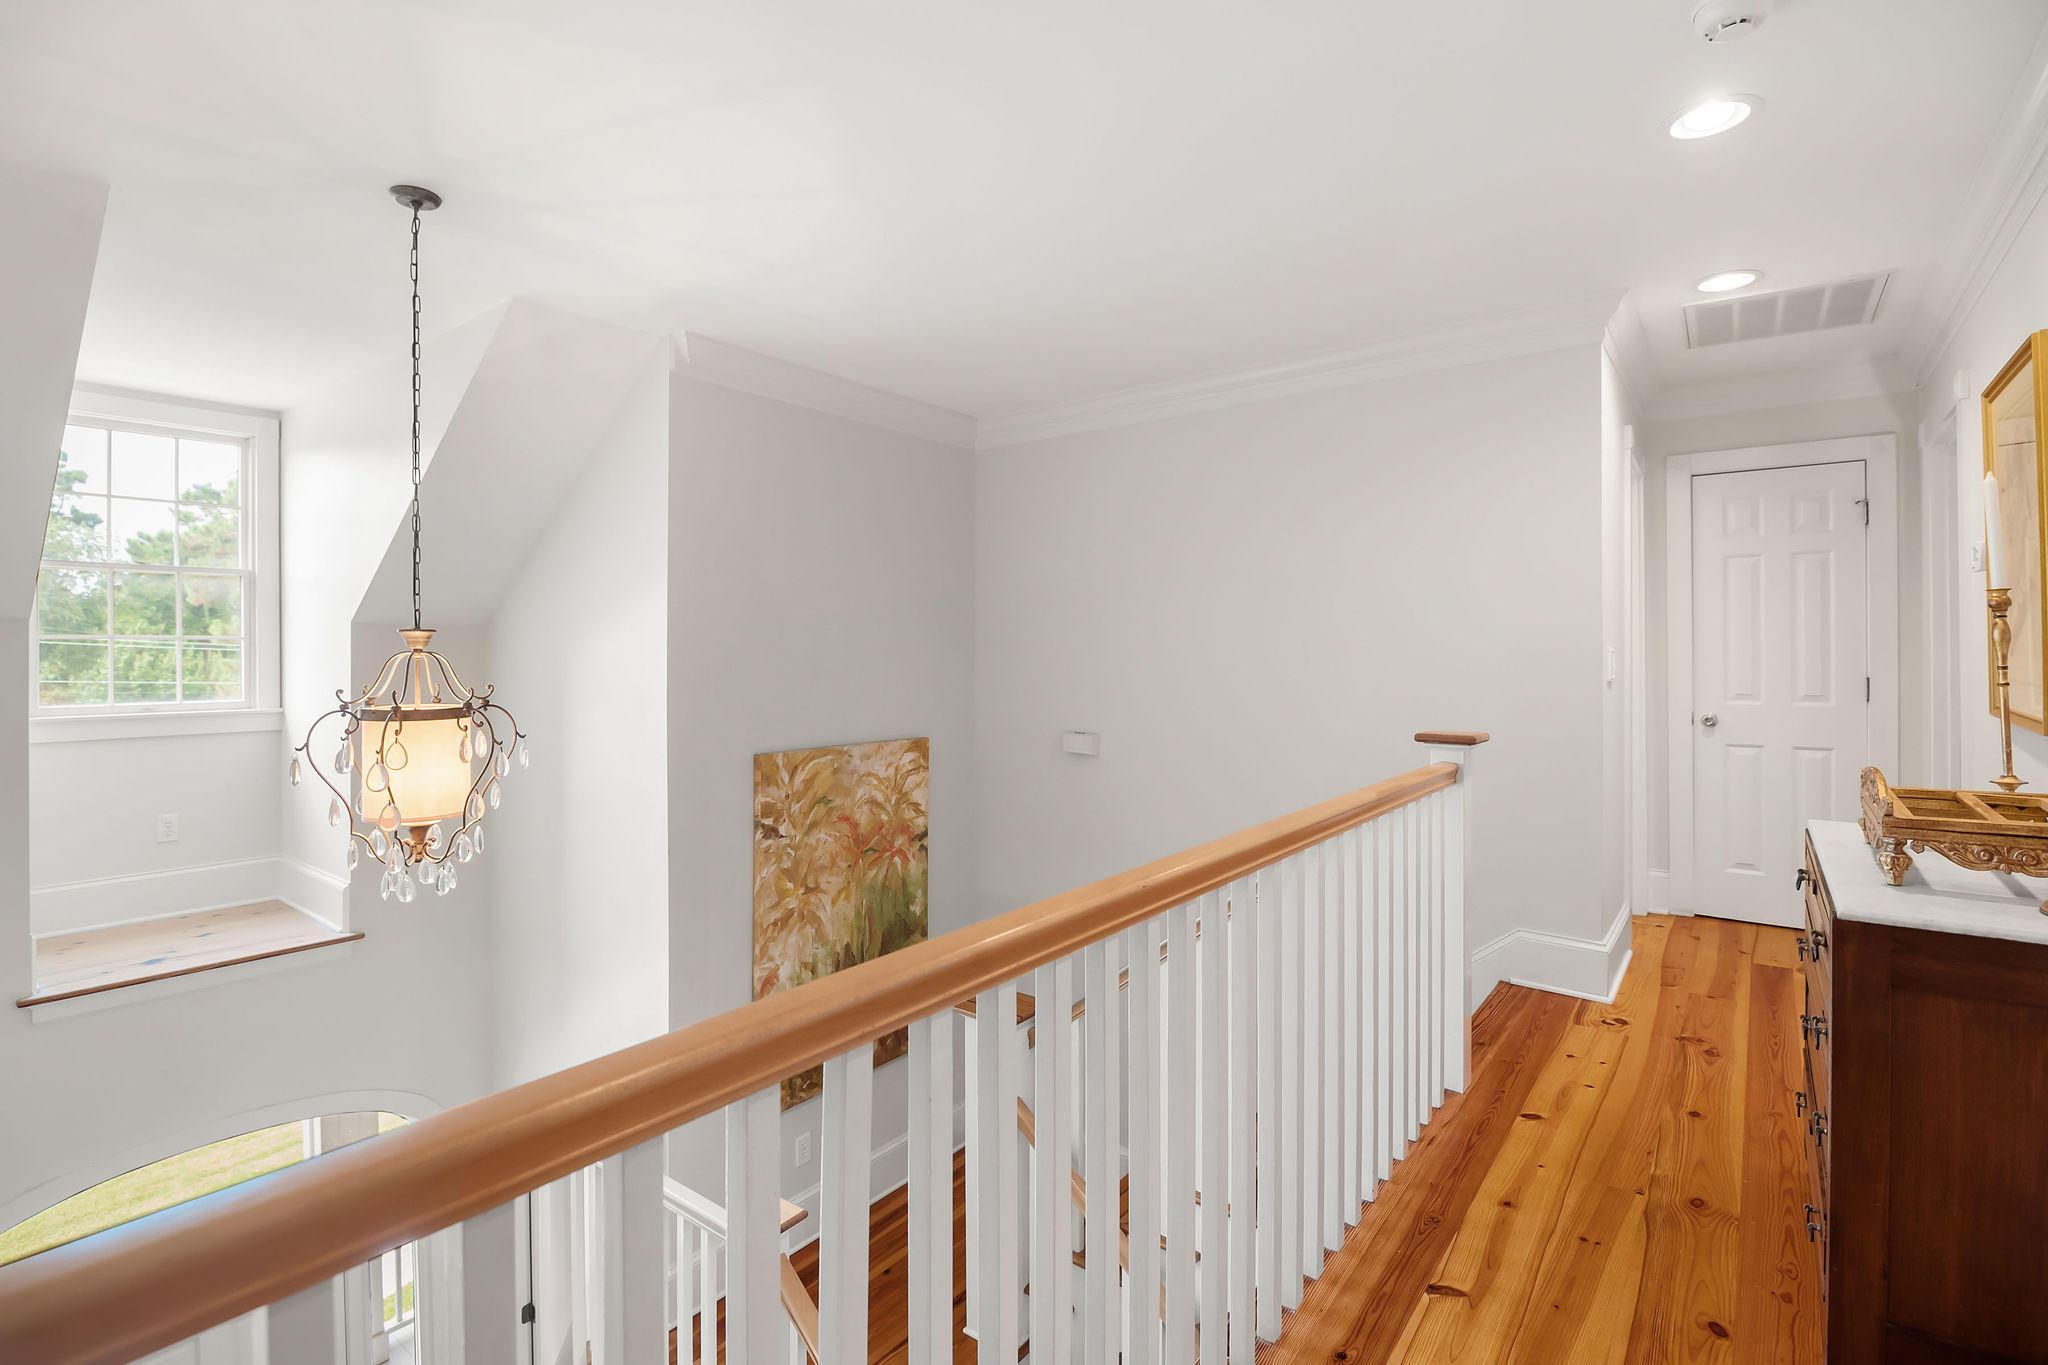 Country Club II Homes For Sale - 1482 Burningtree, Charleston, SC - 29